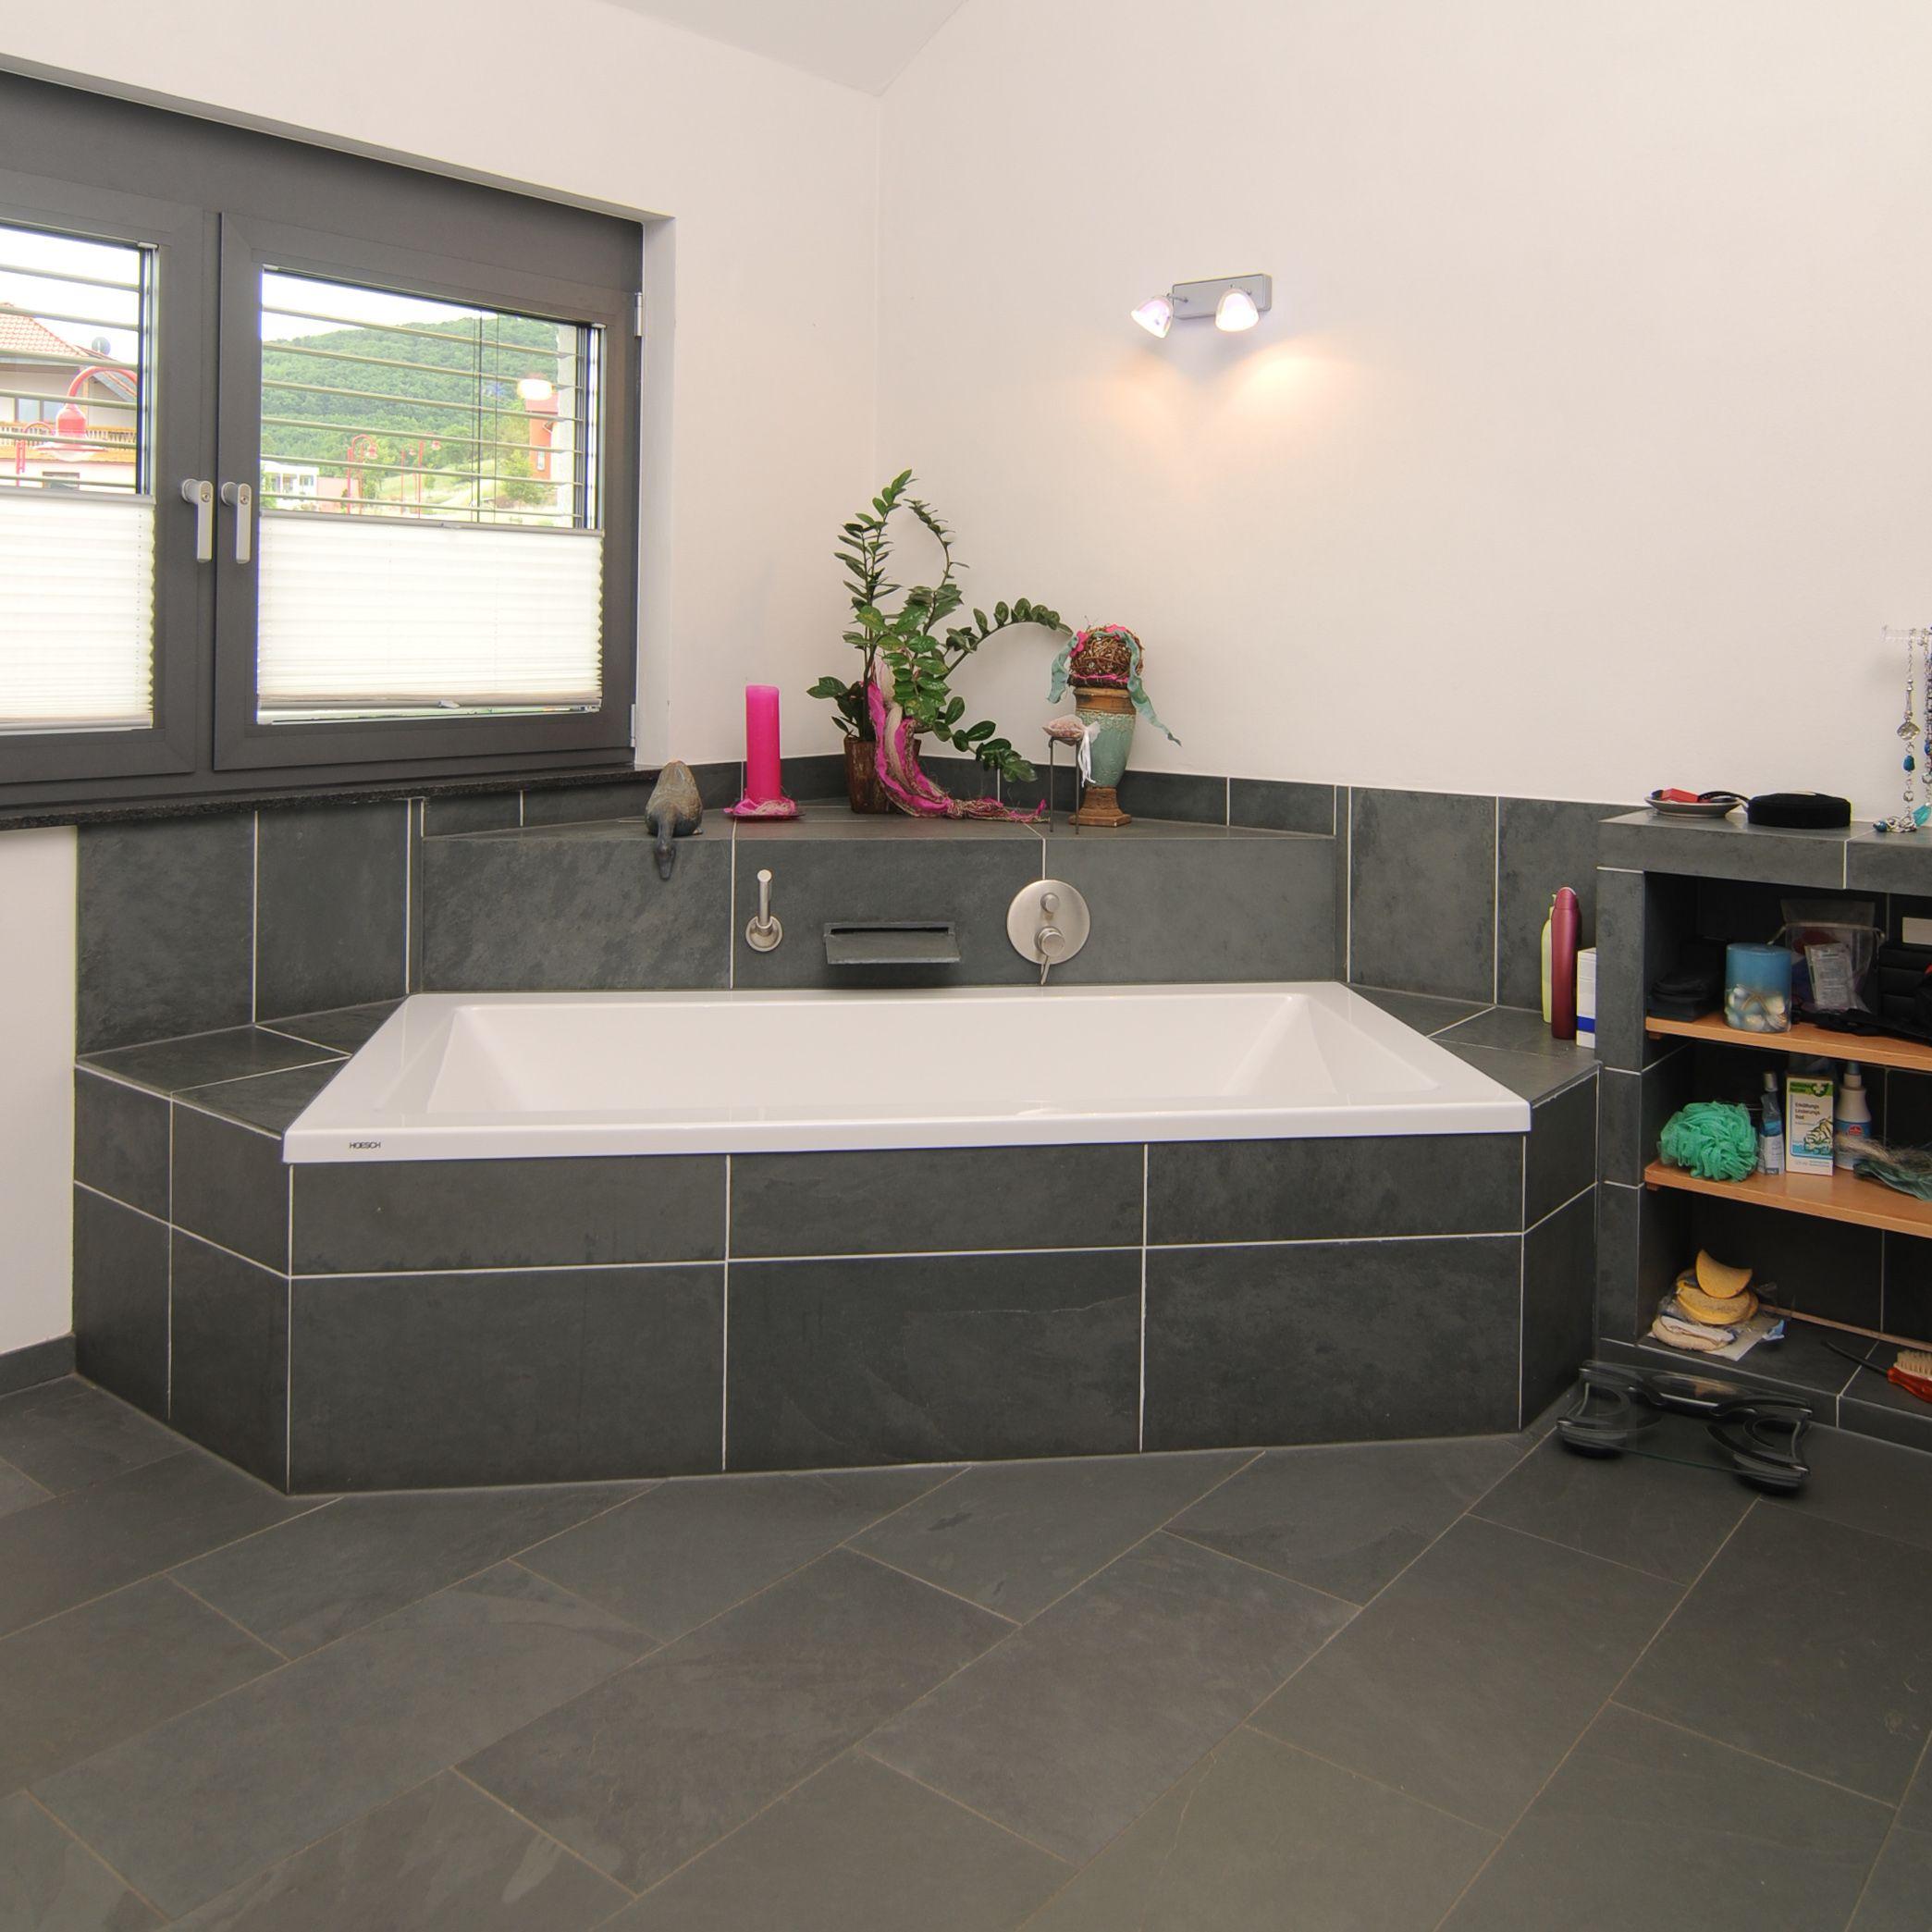 Planung Badezimmer im Neubau Eckbadewanne gefliest mit Dachschräge ... | {Eckbadewanne dachschräge 43}